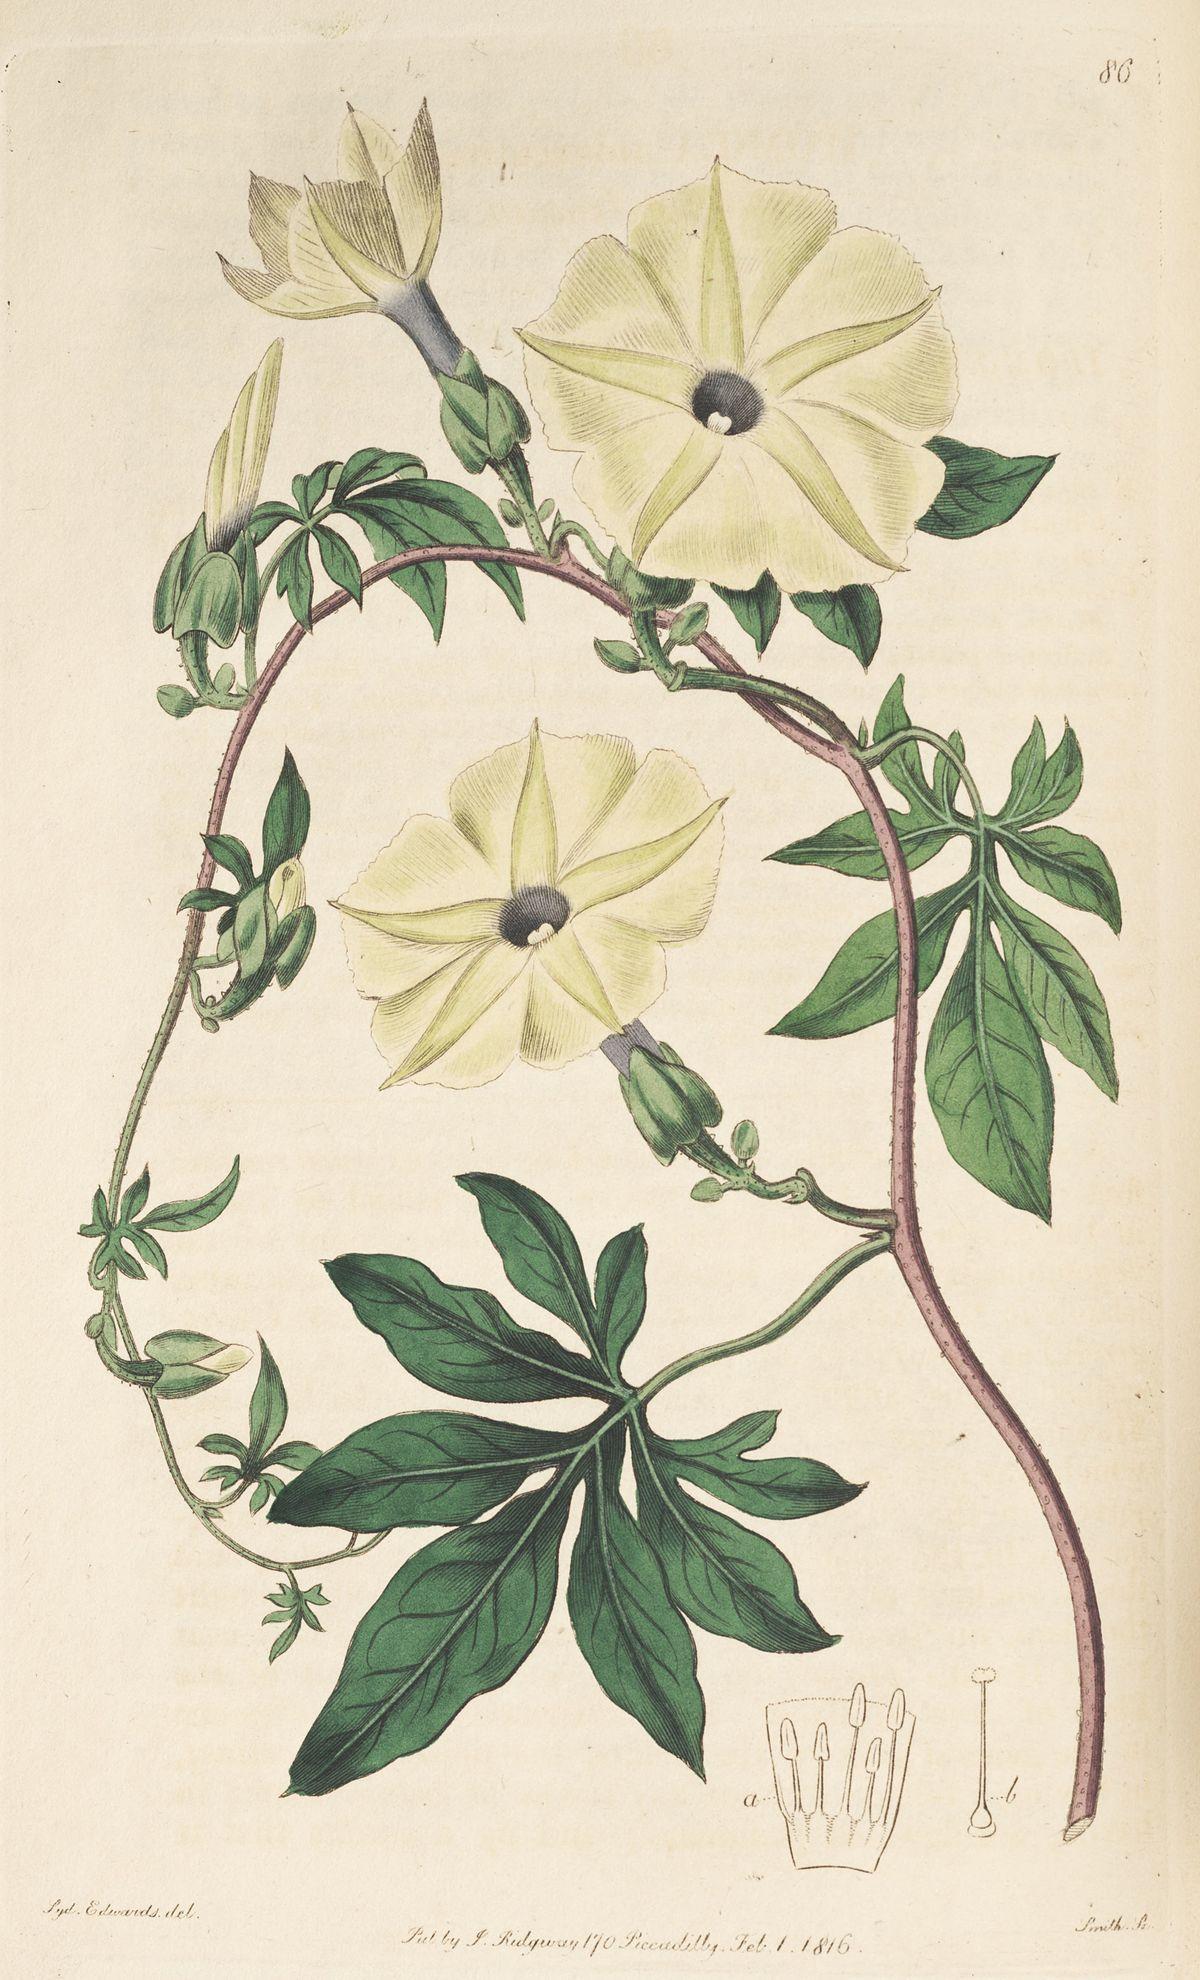 Ipomoea tuberculata - Wikipedia  Ipomoea tubercu...